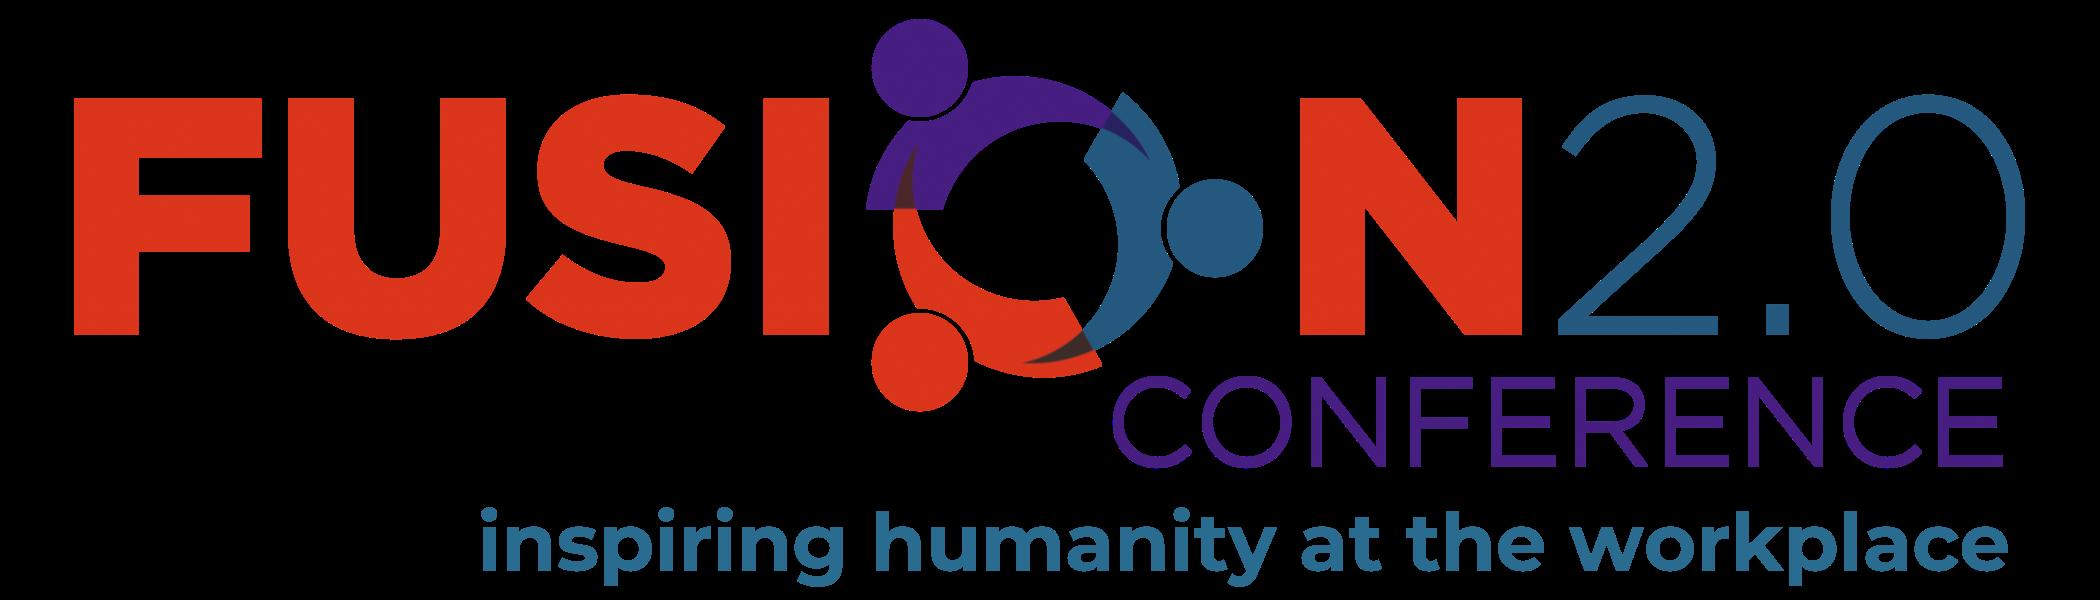 Fusion 2.0 Conference Logo